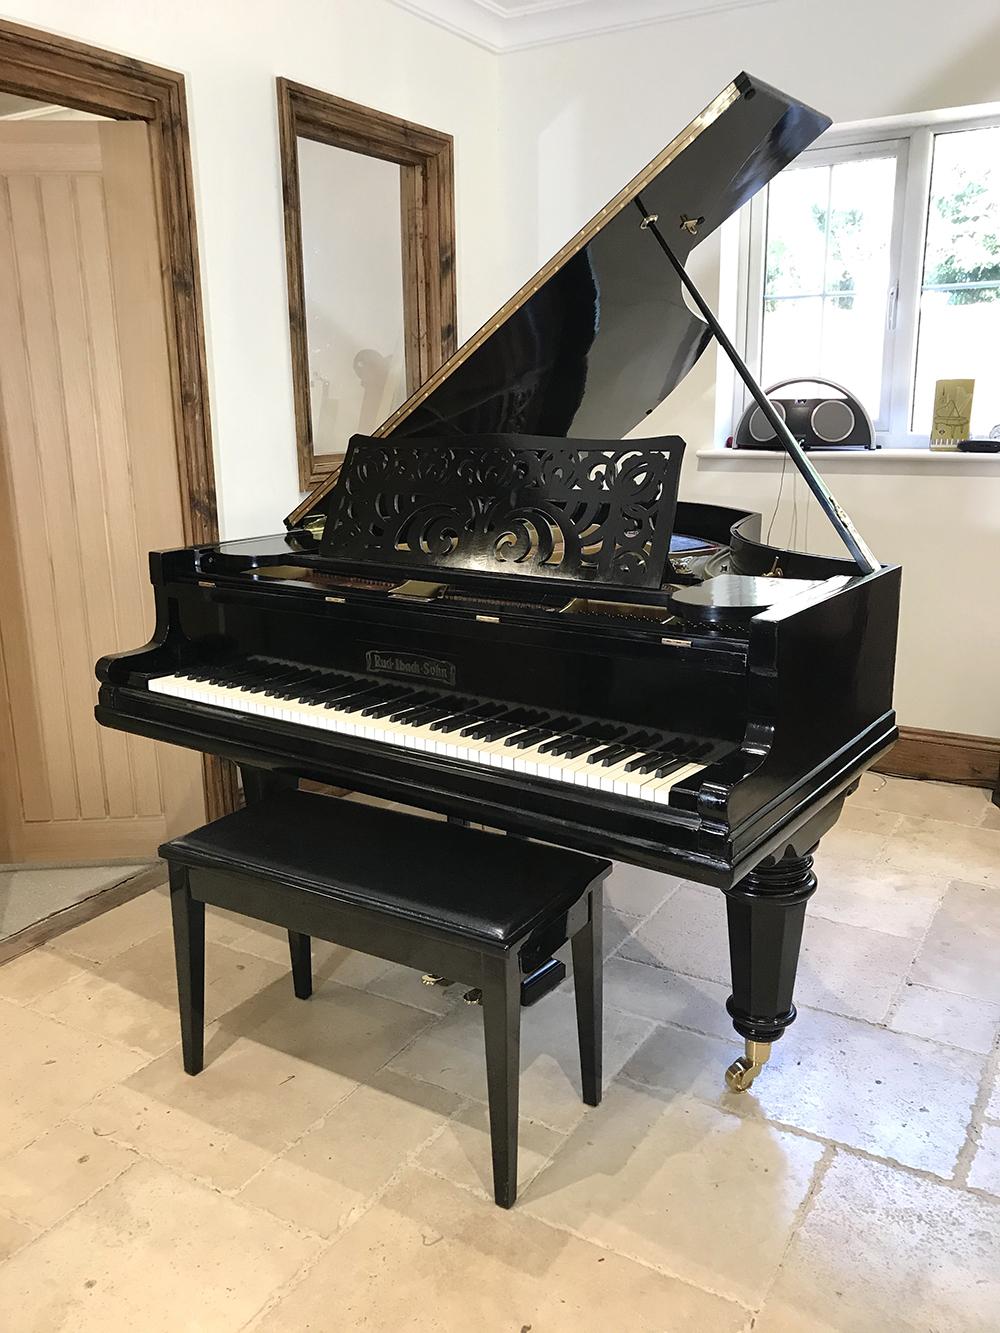 rud,ibach,sohn,boudoir,grand,piano,dorset,showroom,restoration,rebuild,restored,traditional,unique,german,prussion,black,